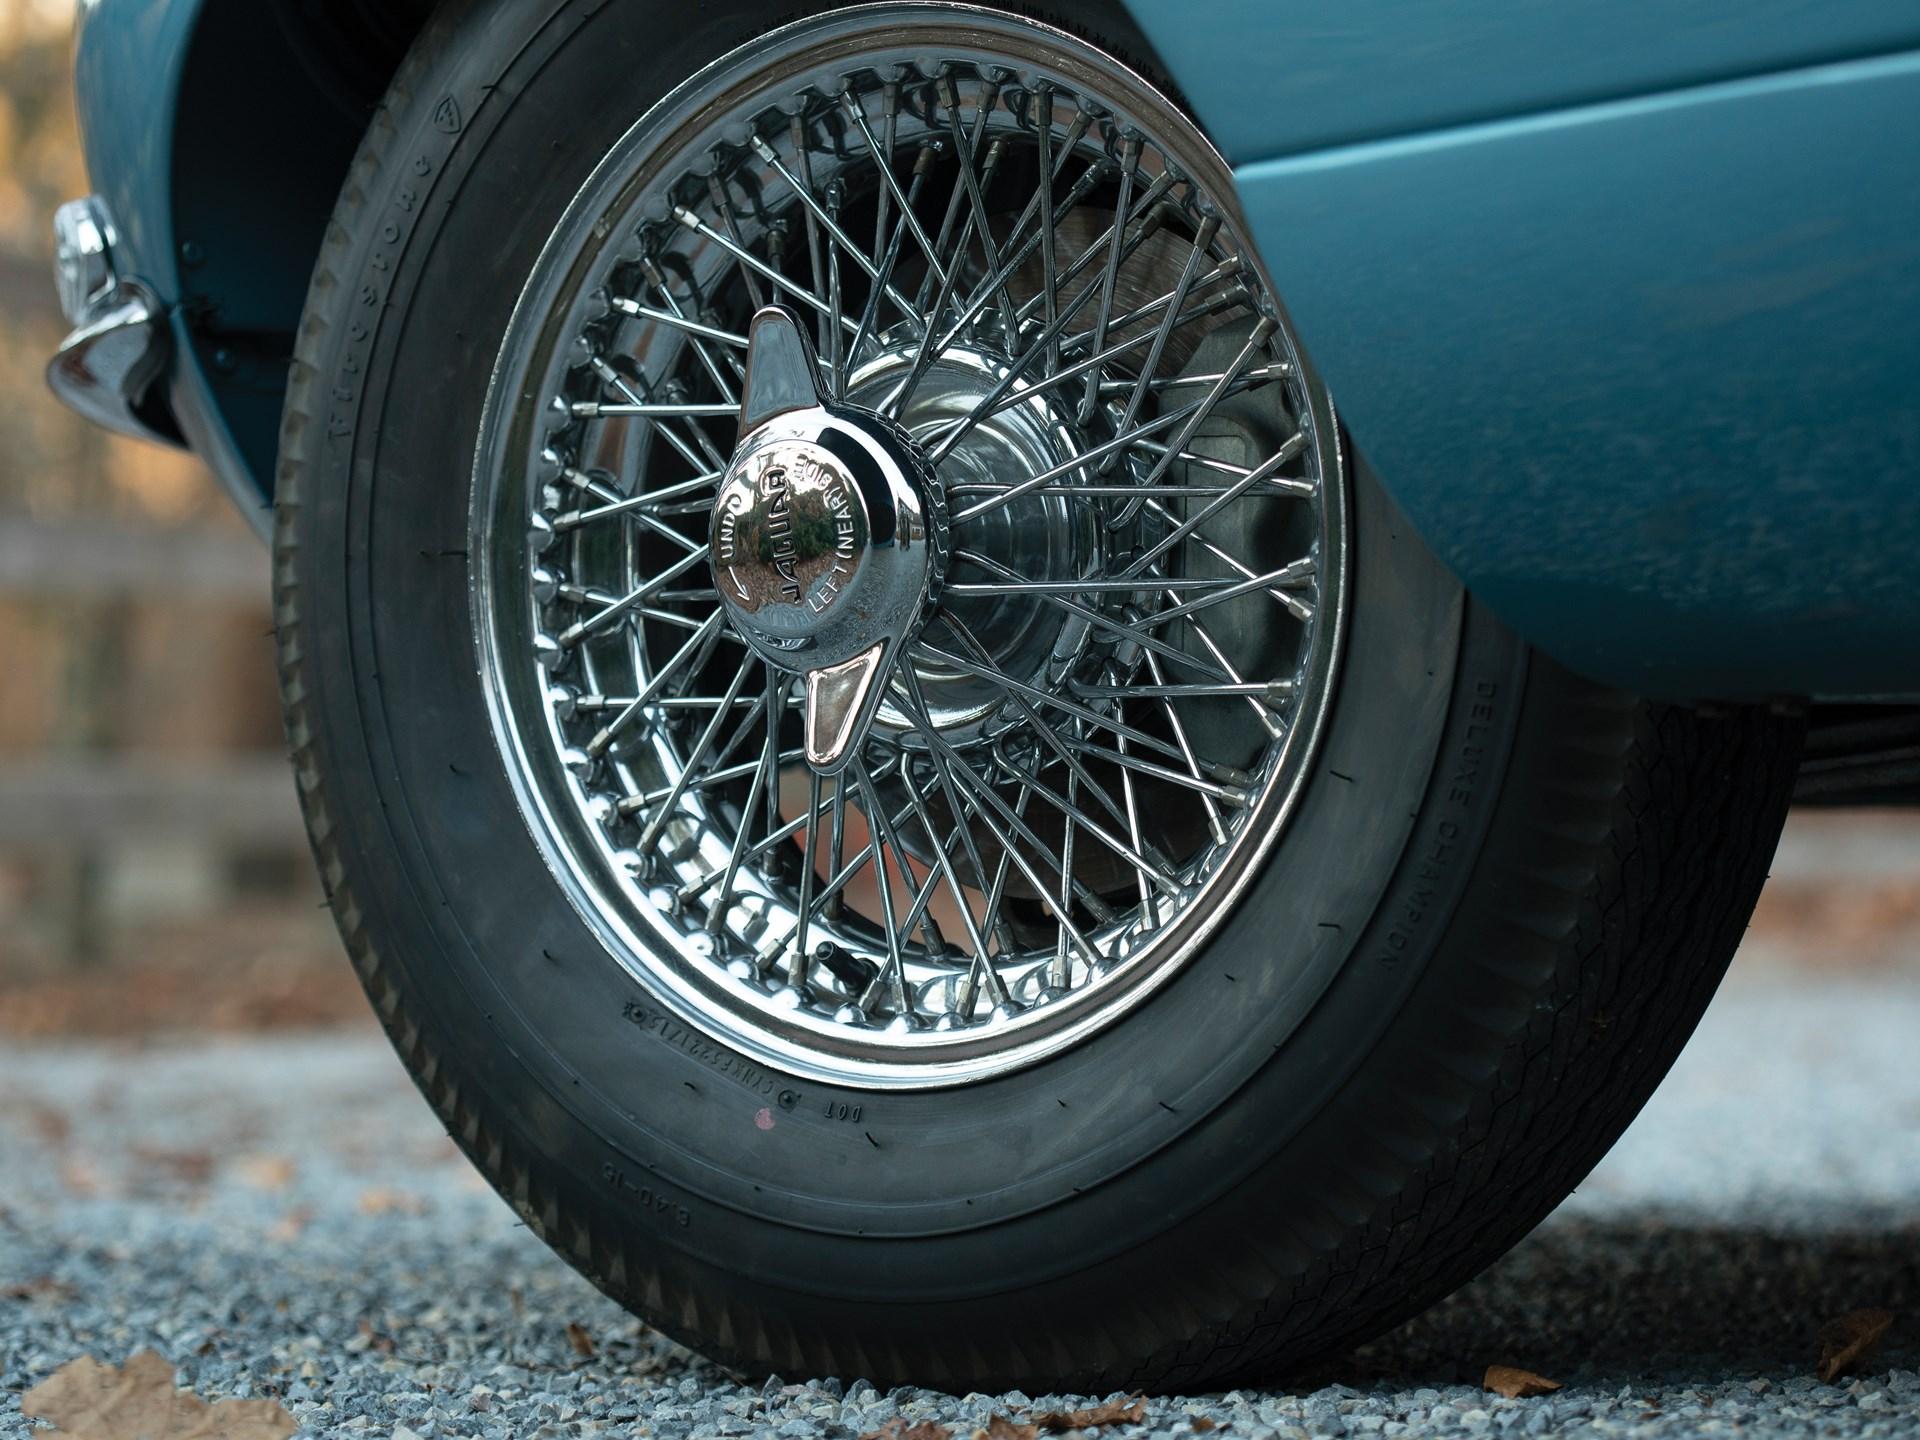 1962 Jaguar E-Type Series 1 3.8-Litre Fixed Head Coupe